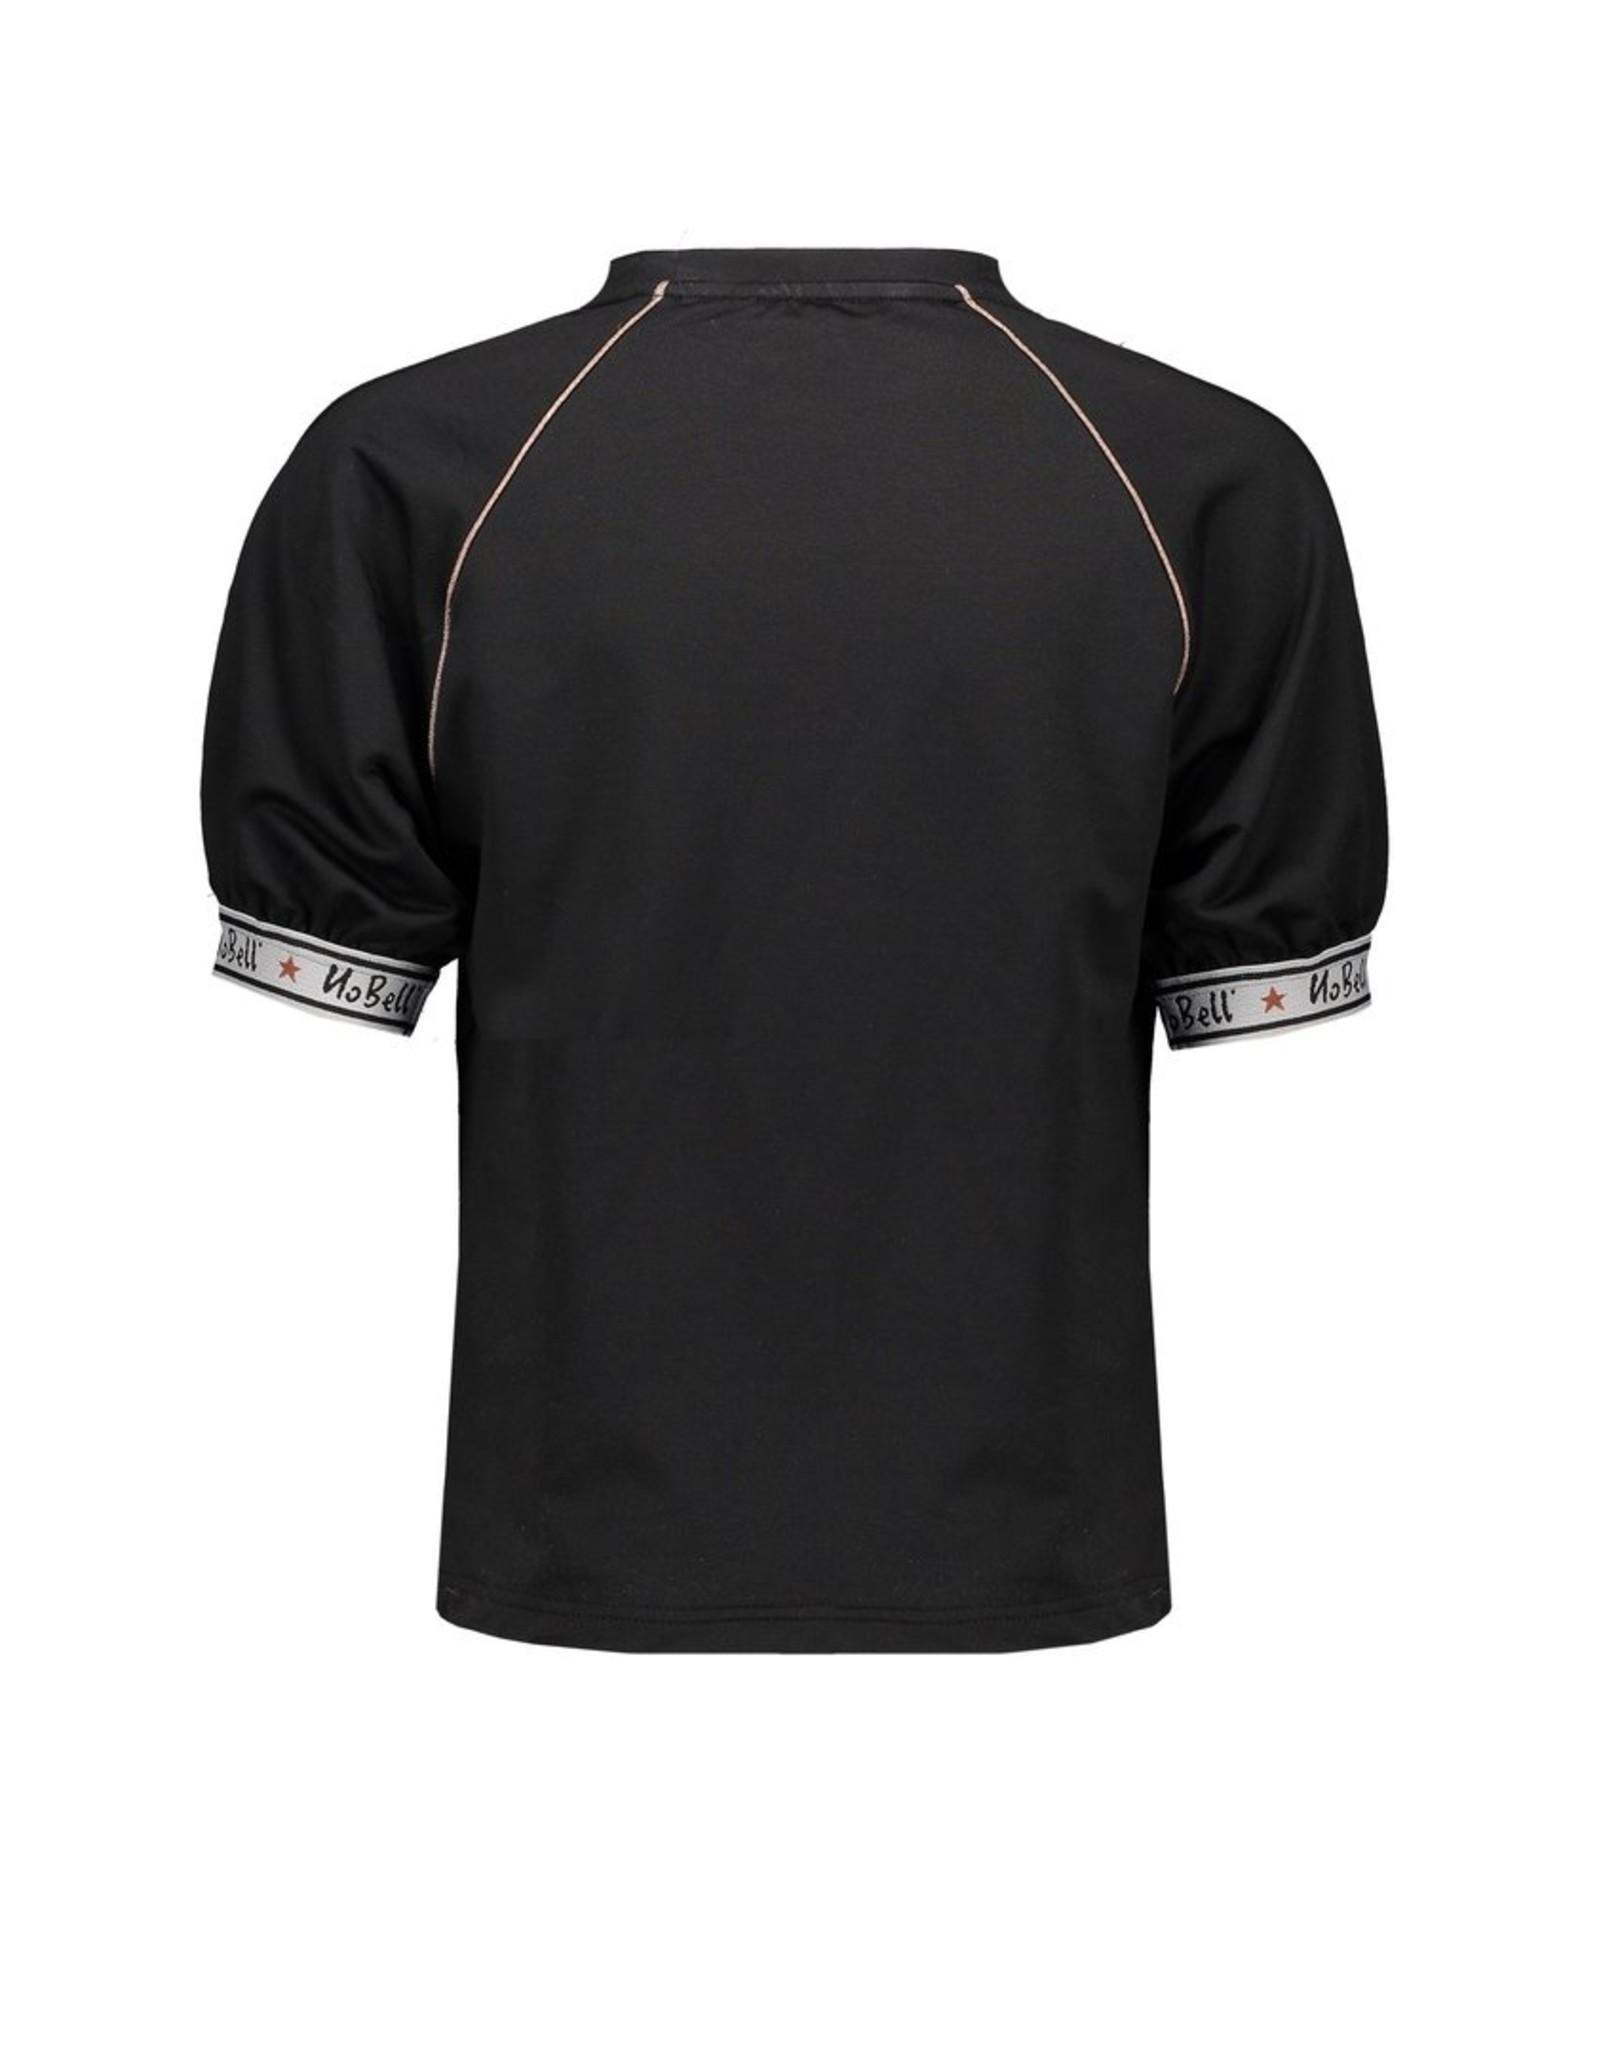 NoBell Nobell Kally Oversized Sweat With Raglan 3/4 Length Sleeve